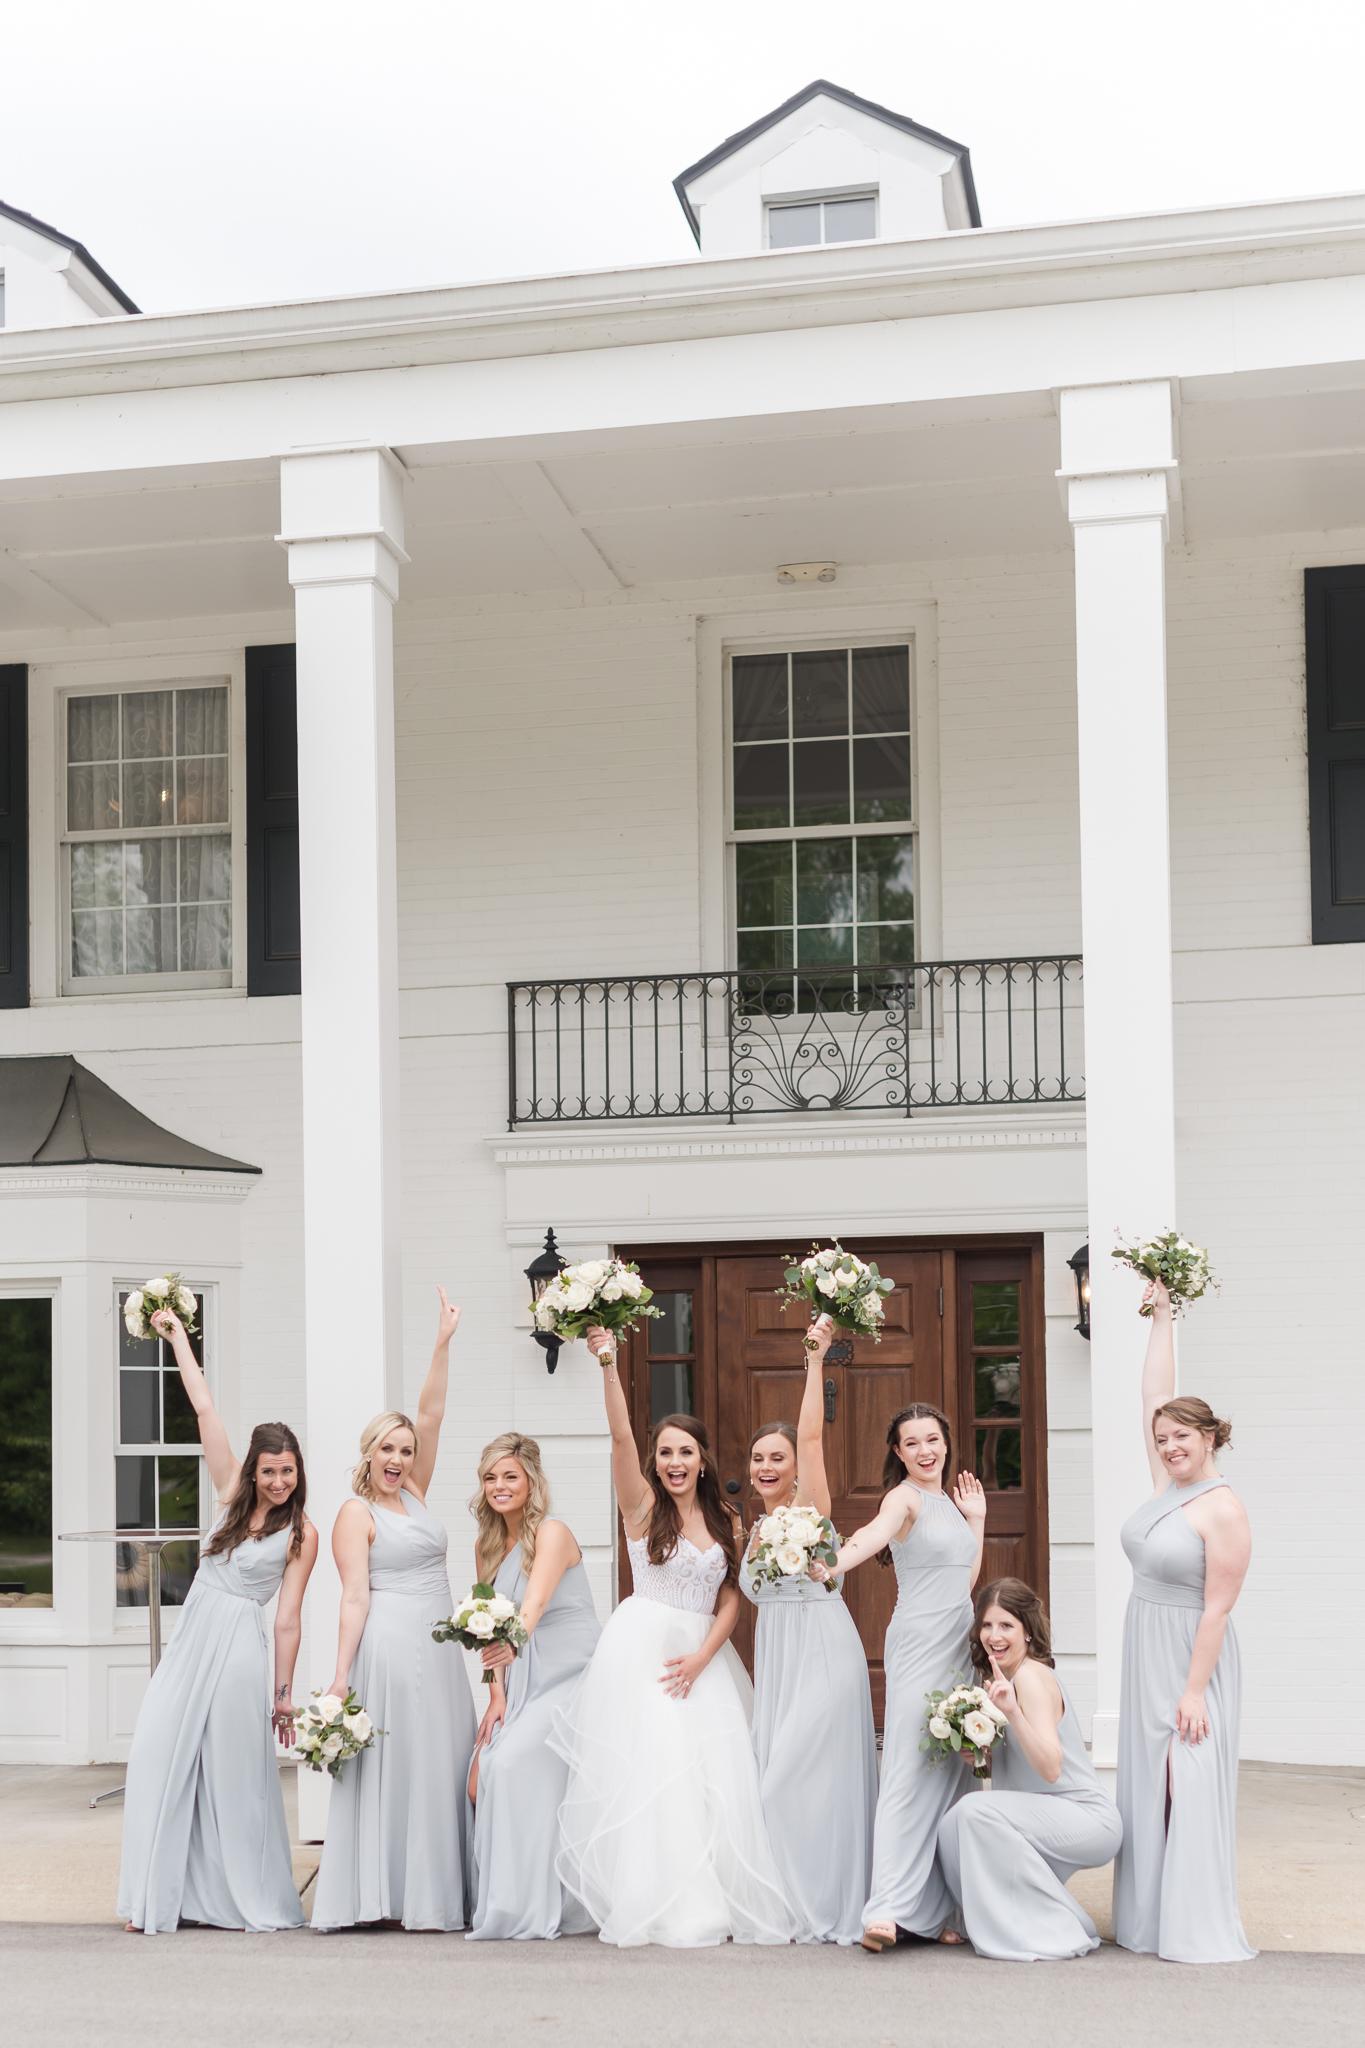 Black Iris Estate Wedding Elegant White with Greenery Luxury High End Flowers-13.jpg